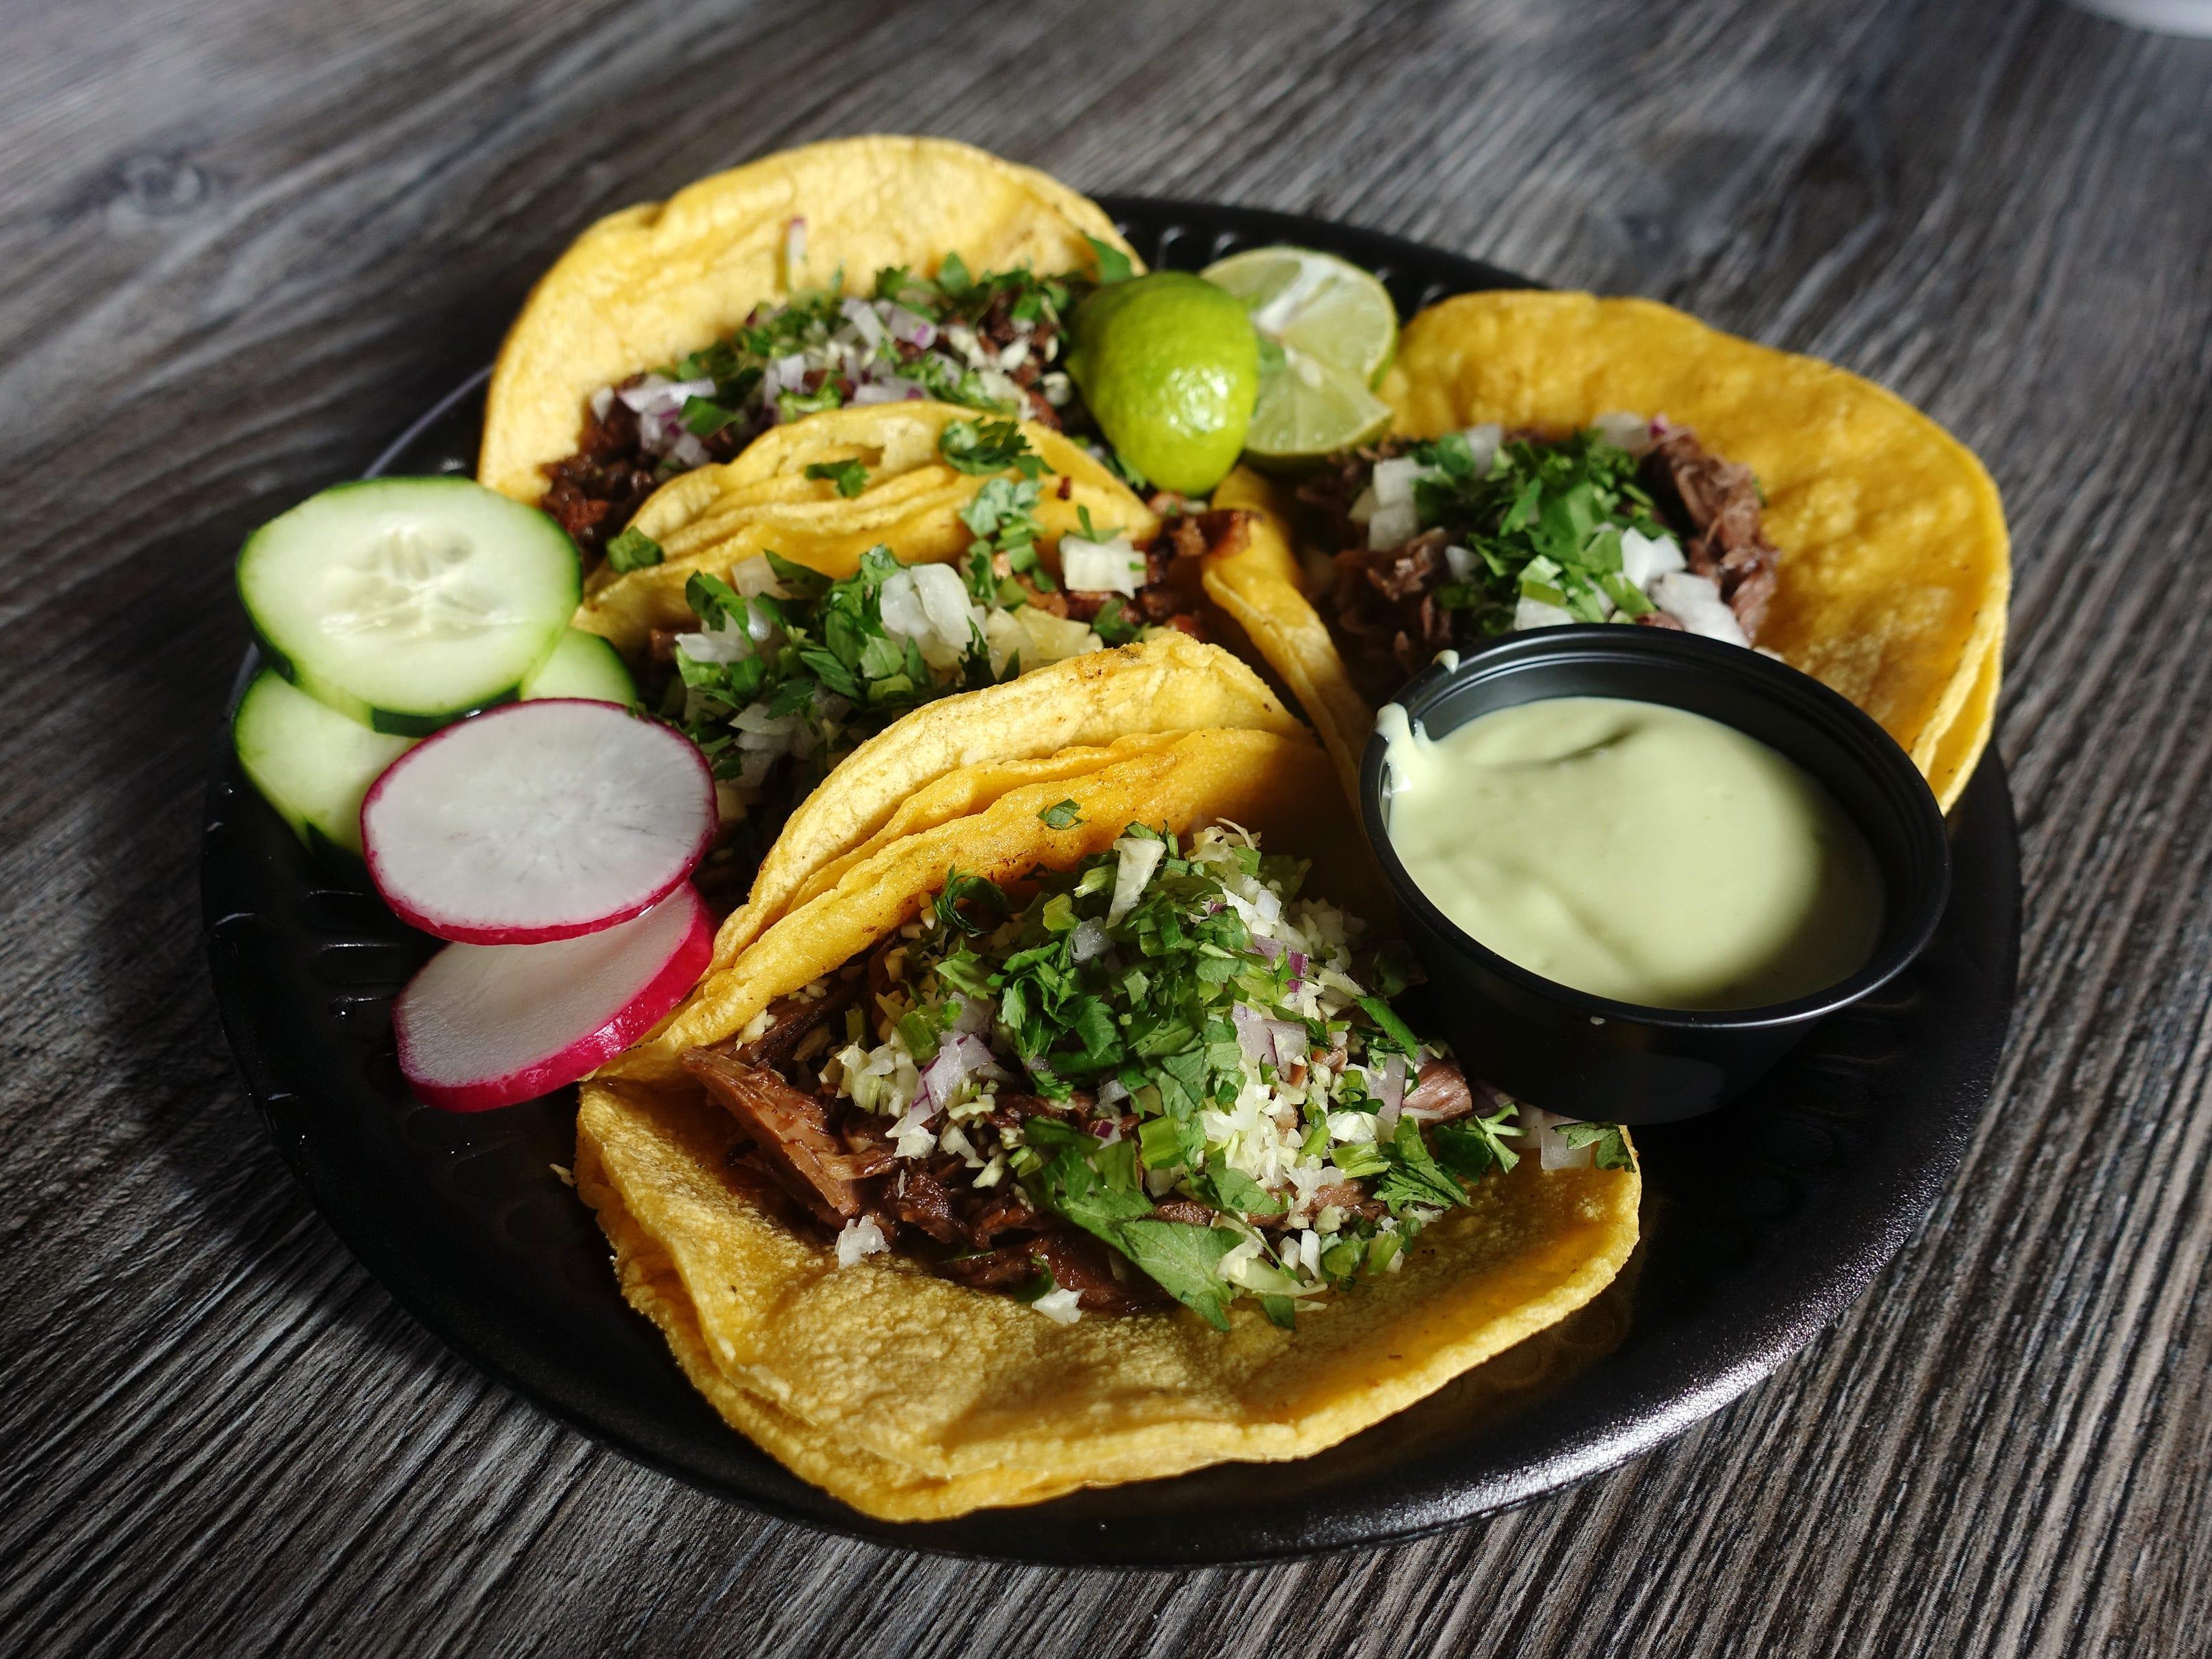 Tacos at Tacos Culichi in Phoenix.